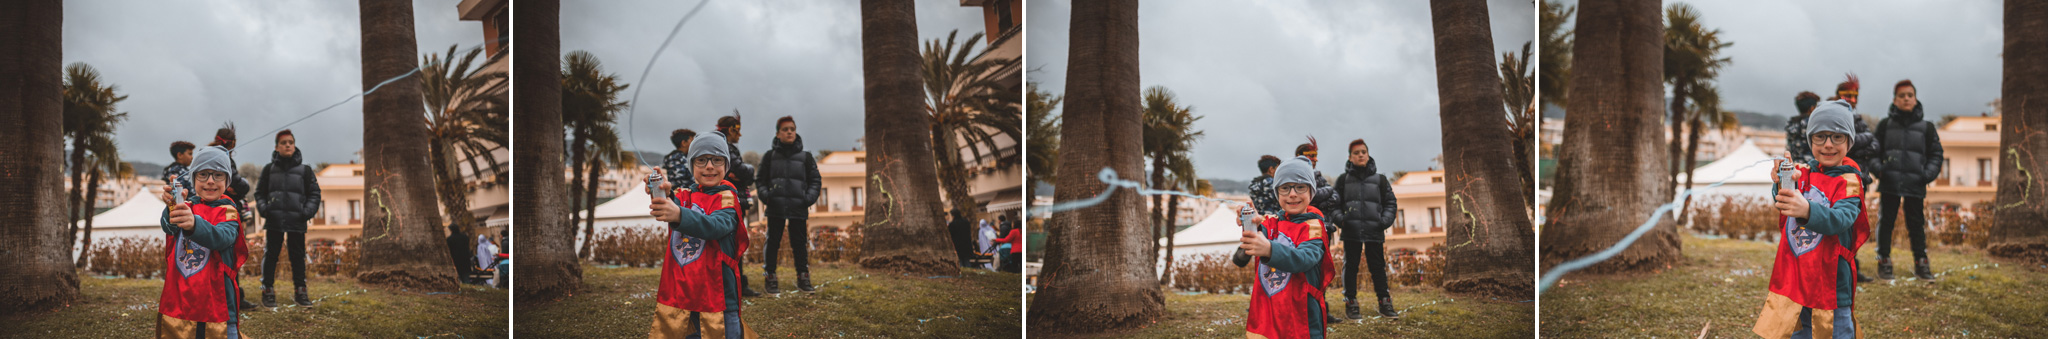 190-wedding-photographer-in-torre-del-greco.jpg